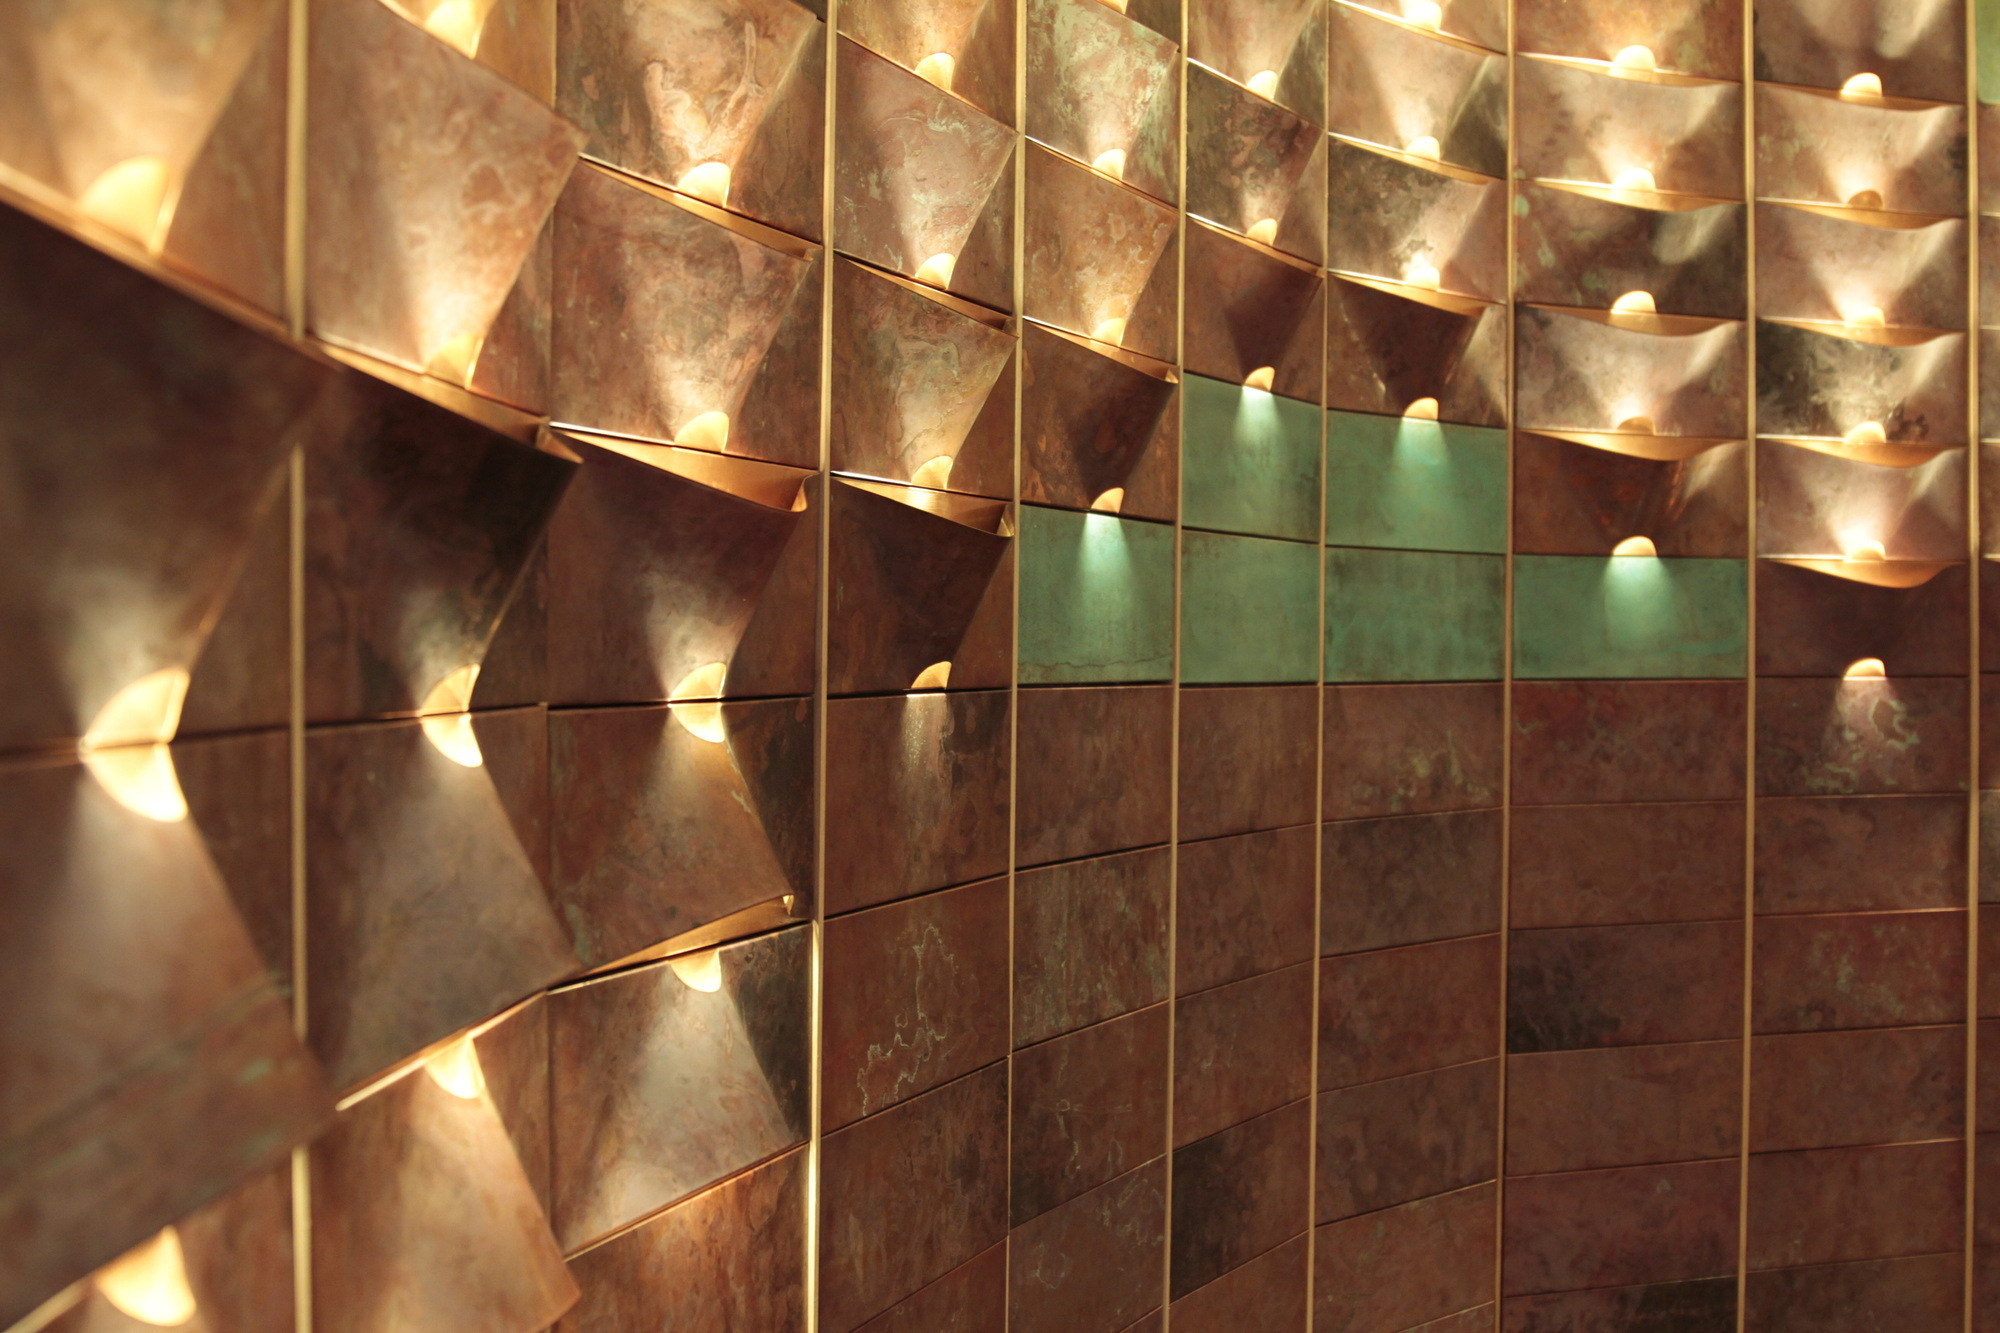 Revestimiento de muro lum qstudio plataforma arquitectura - Revestimiento de muros ...